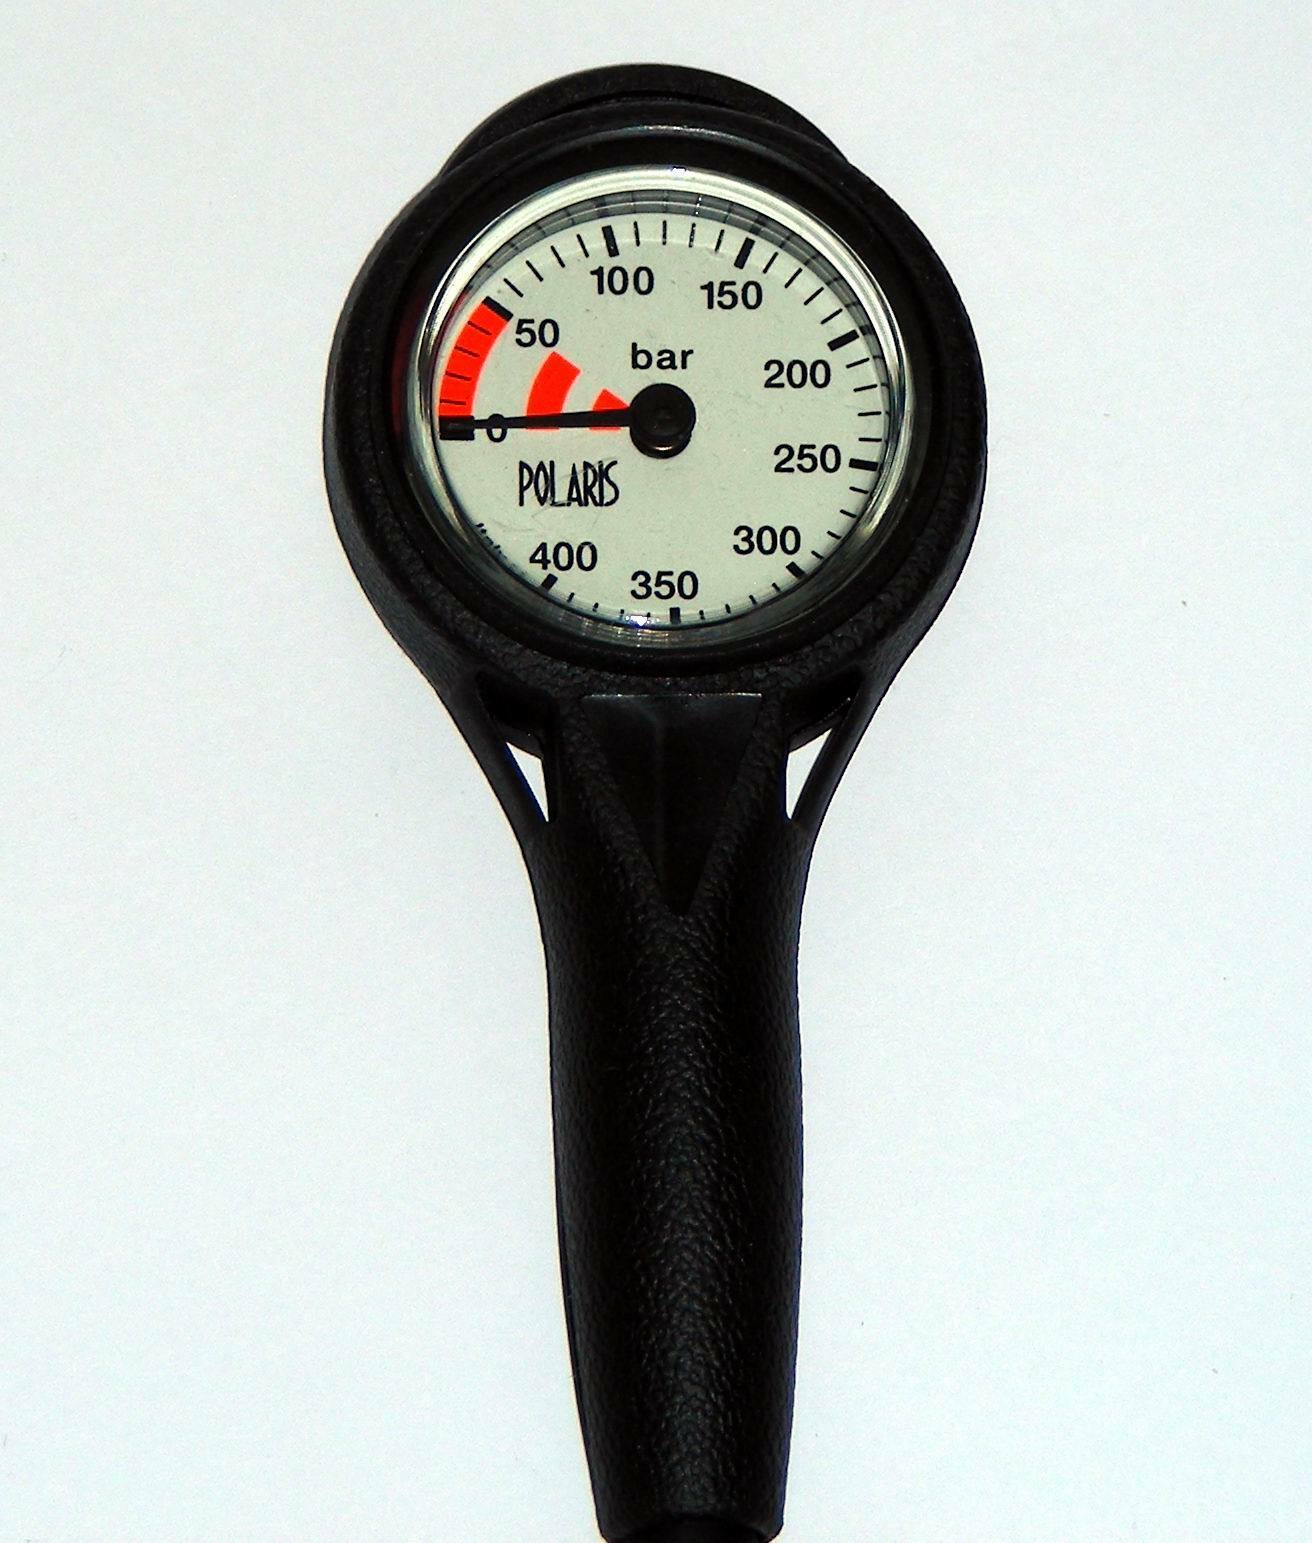 Finimeter 0-400 Bar - Slim Slim Slim Line SPG Messingkapsel 85748f